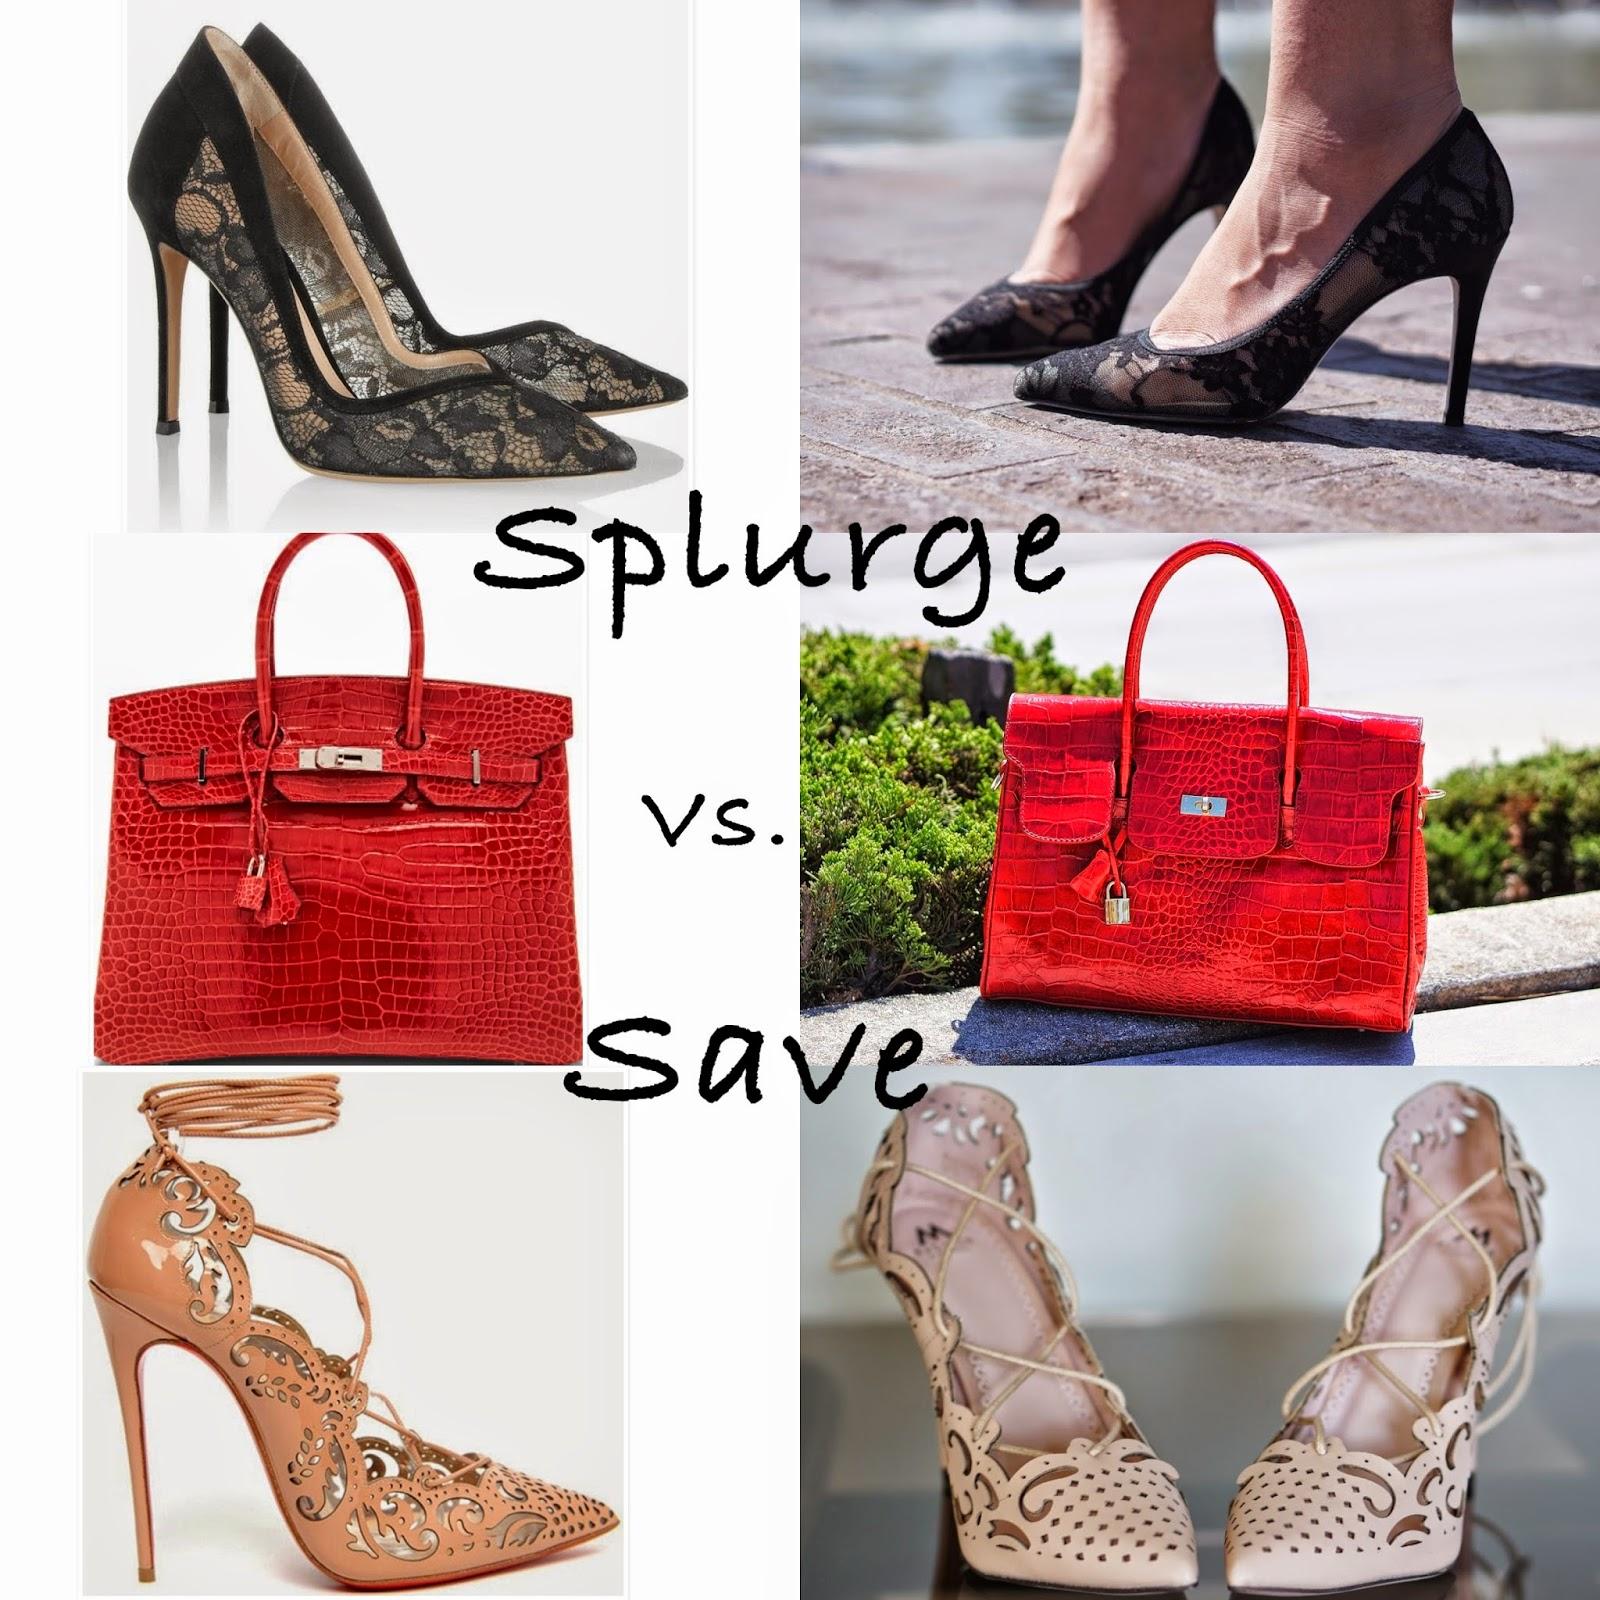 Hermes 35cm Crocodile Birkin Red, Gianvito Rossi Lace Pumps, Black Lace Heels,Shoemint Lace heels